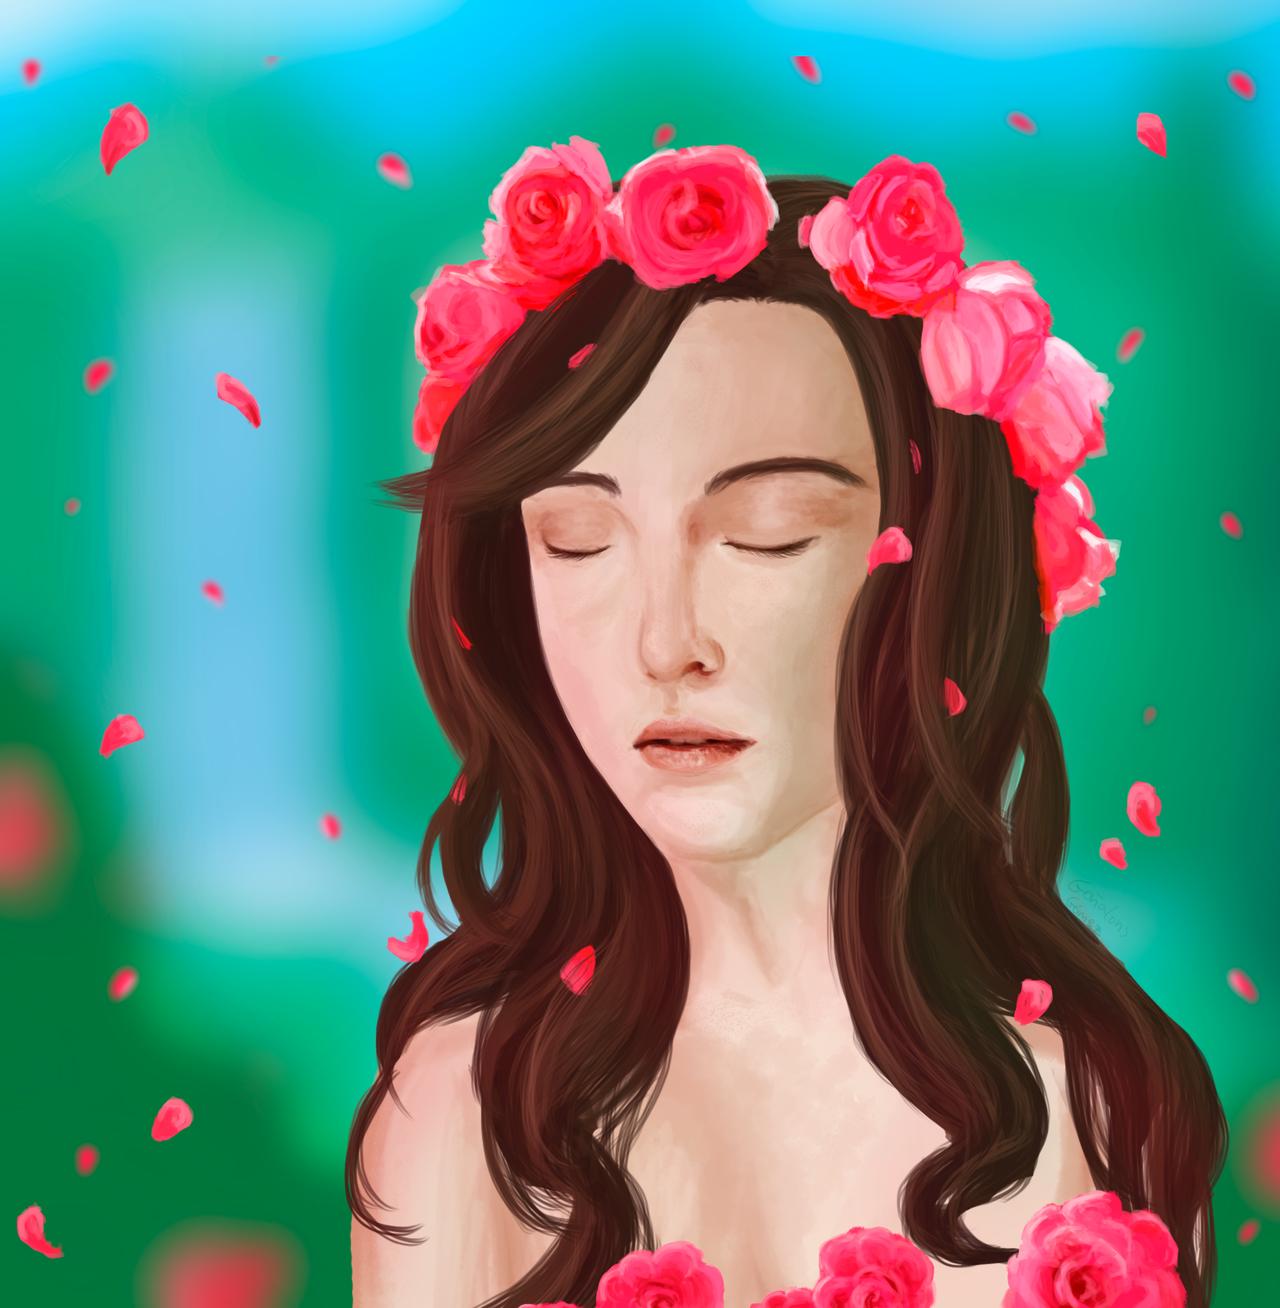 Primavera by Foxymon